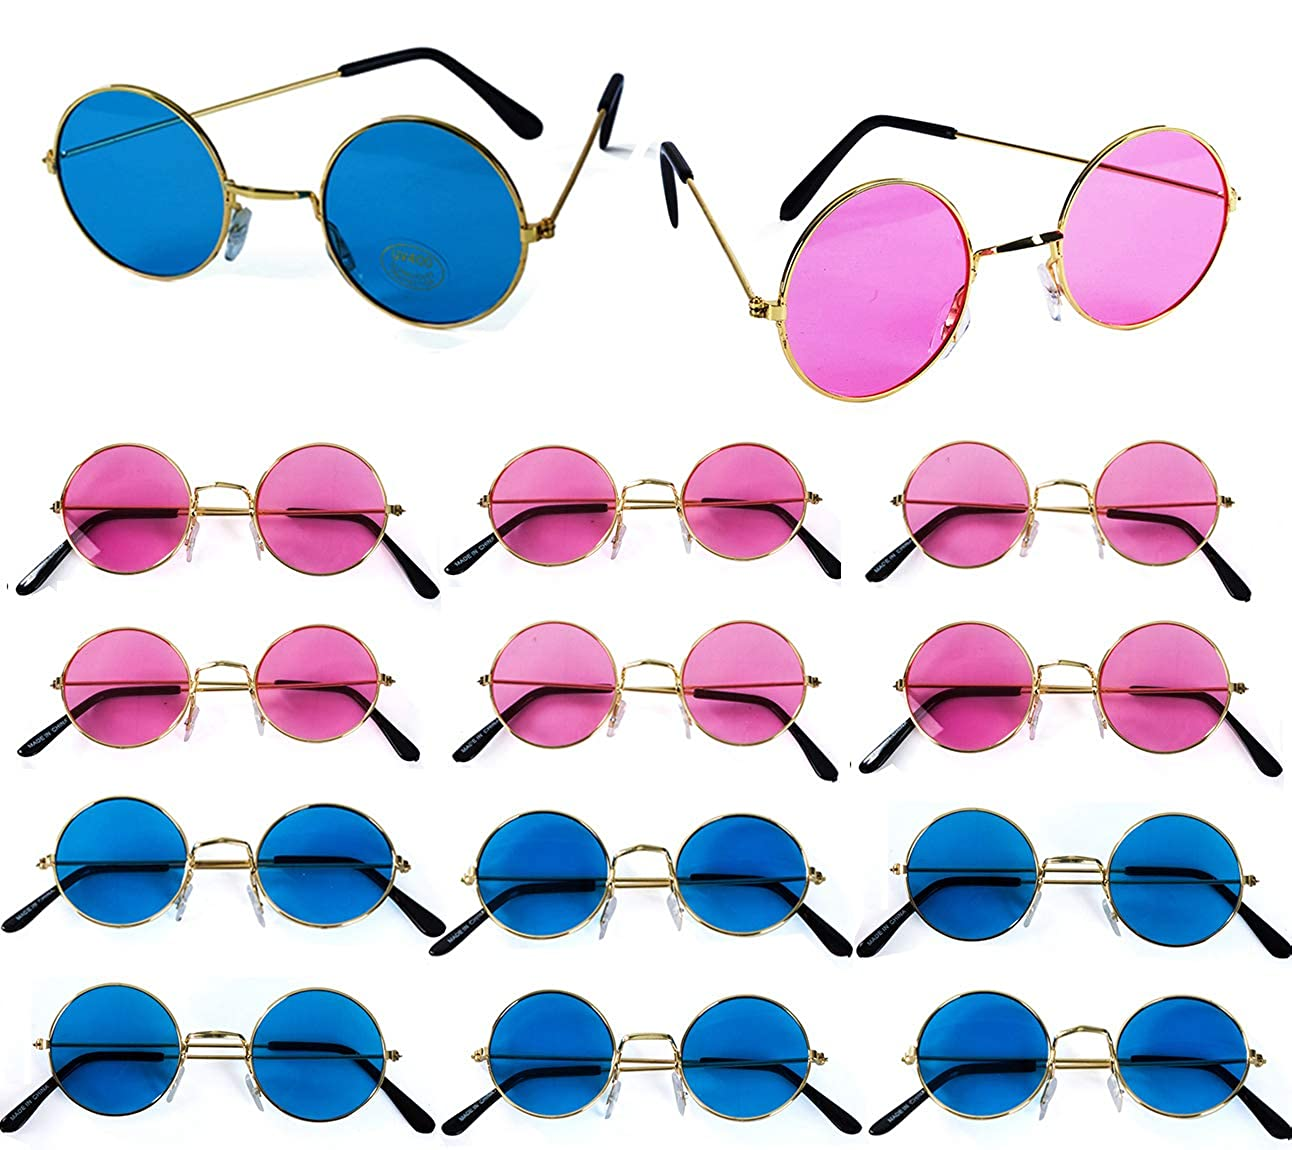 John Lennon Sunglasses – 12 Pack Retro Sunglasses – Costume Accessories - Hippie Party Supplies by Tigerdoe f-tg134